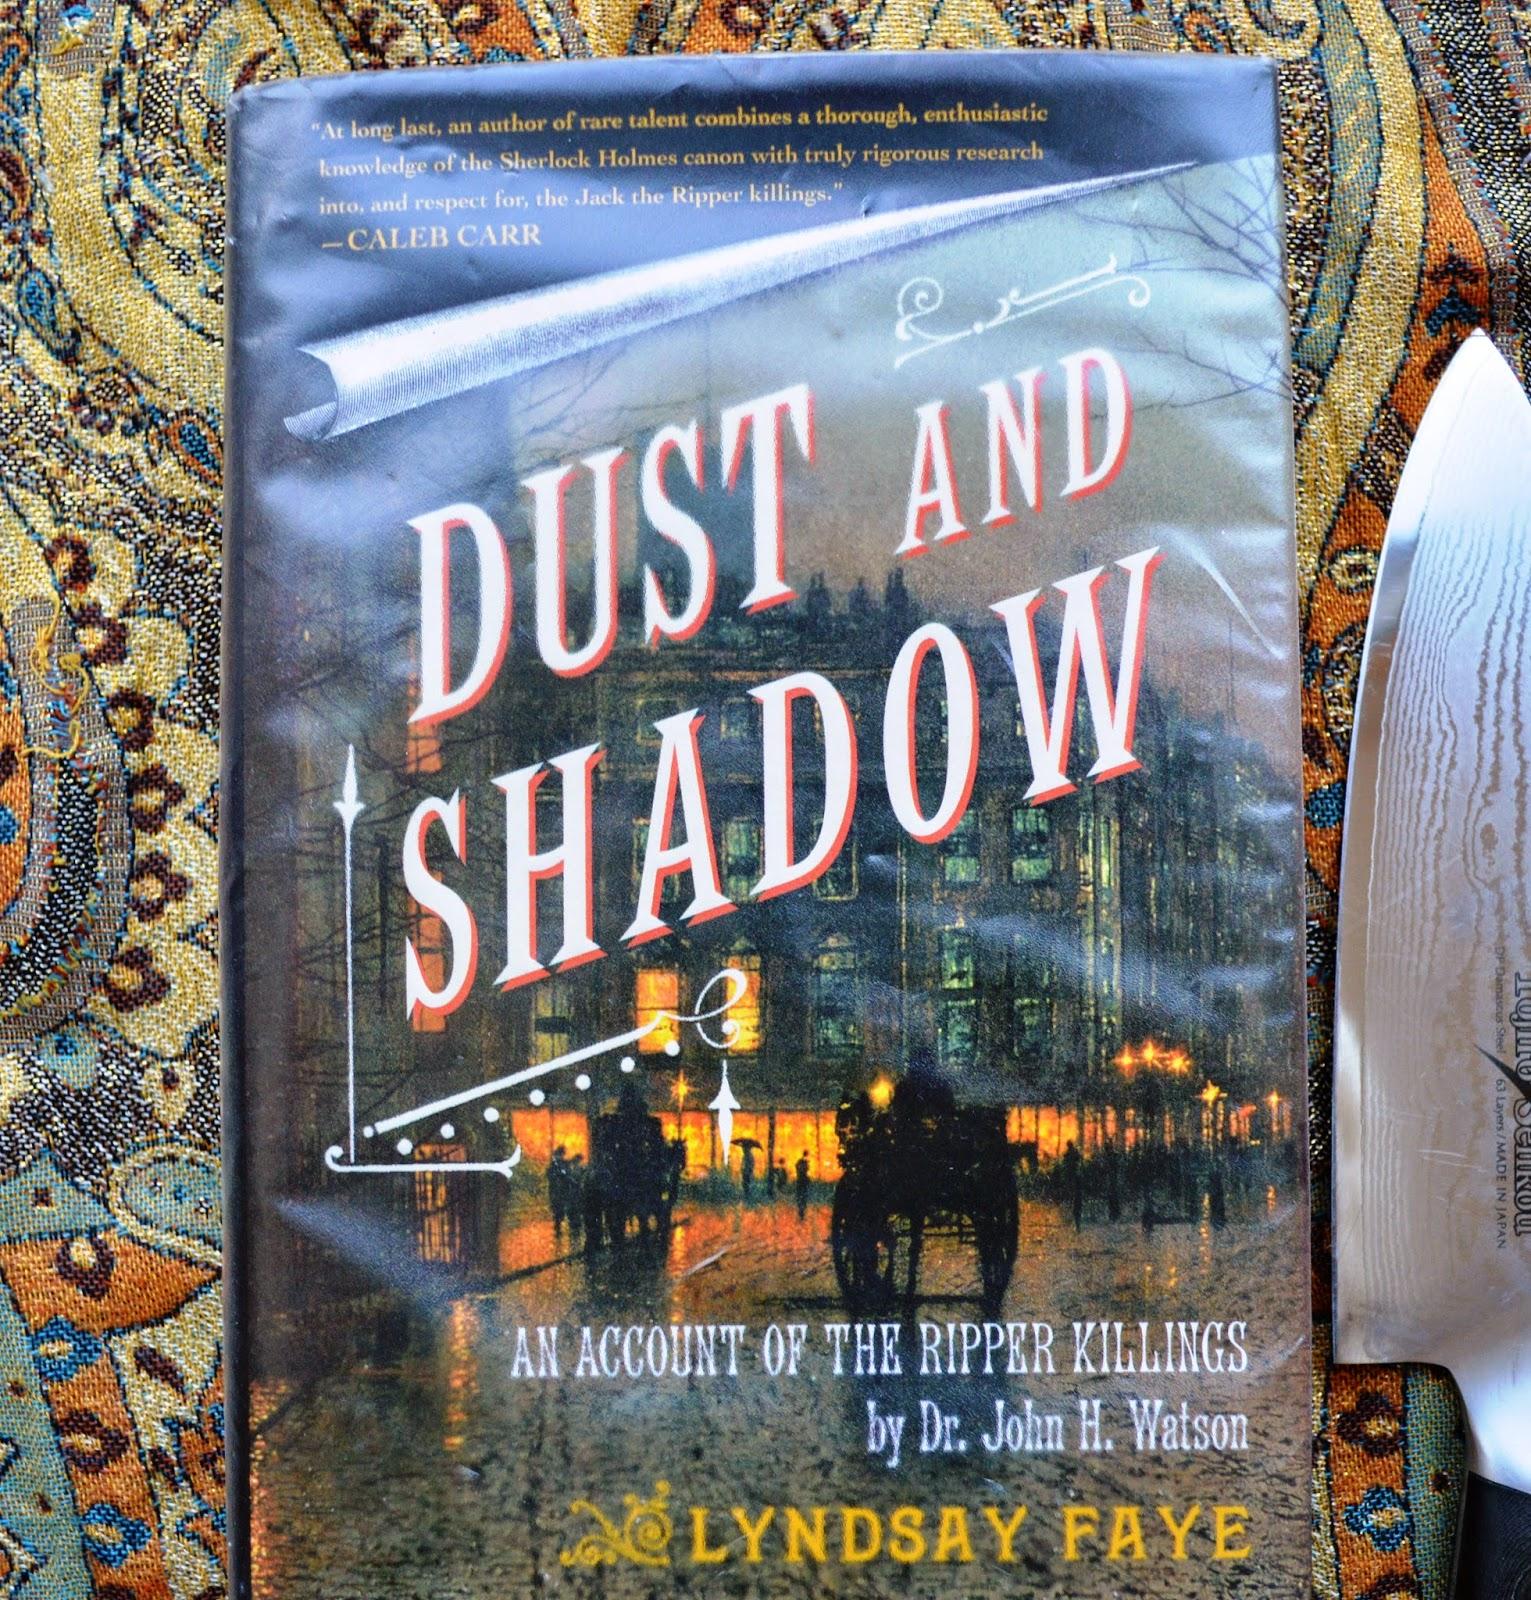 Victorian, modern, Lyndsay Faye, Dust and Shadow, review, detective, Sherlock Holmes, Dr Watson, Jack the Ripper, fiction, hardback